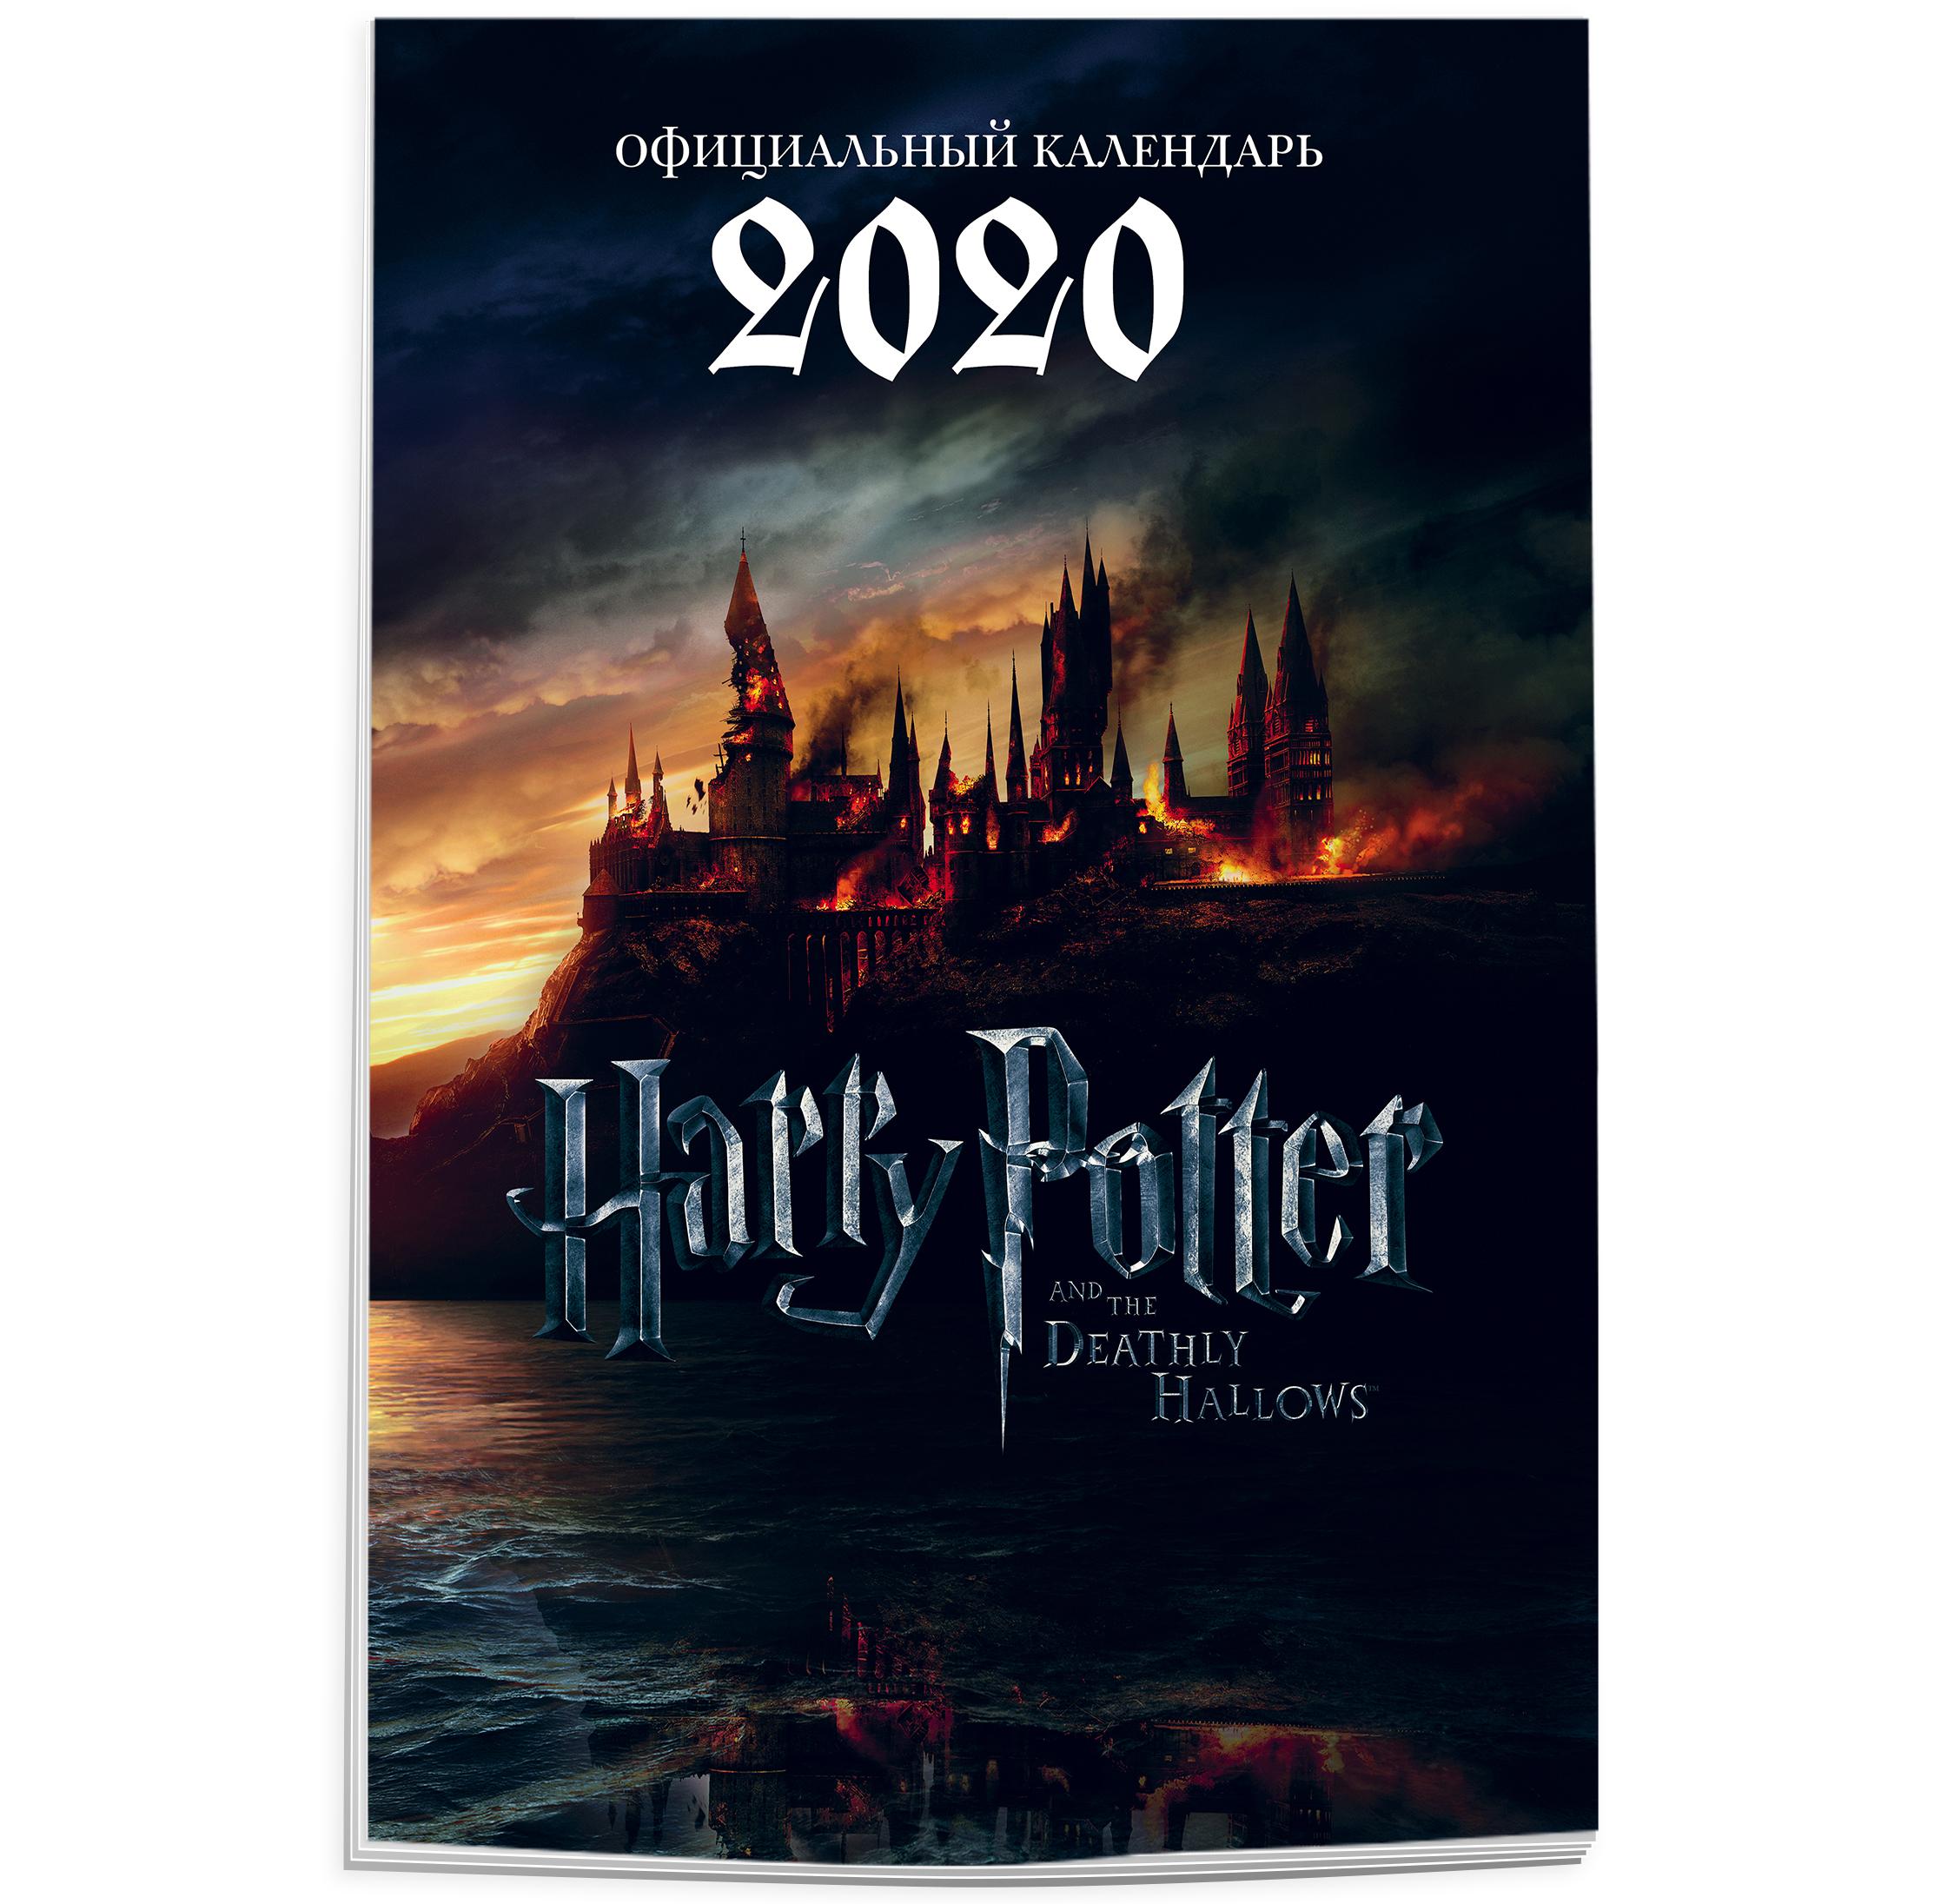 Гарри Поттер. Календарь настенный-постер на 2020 год (315х440 мм) гарри поттер календарь настенный на 2019 год постер